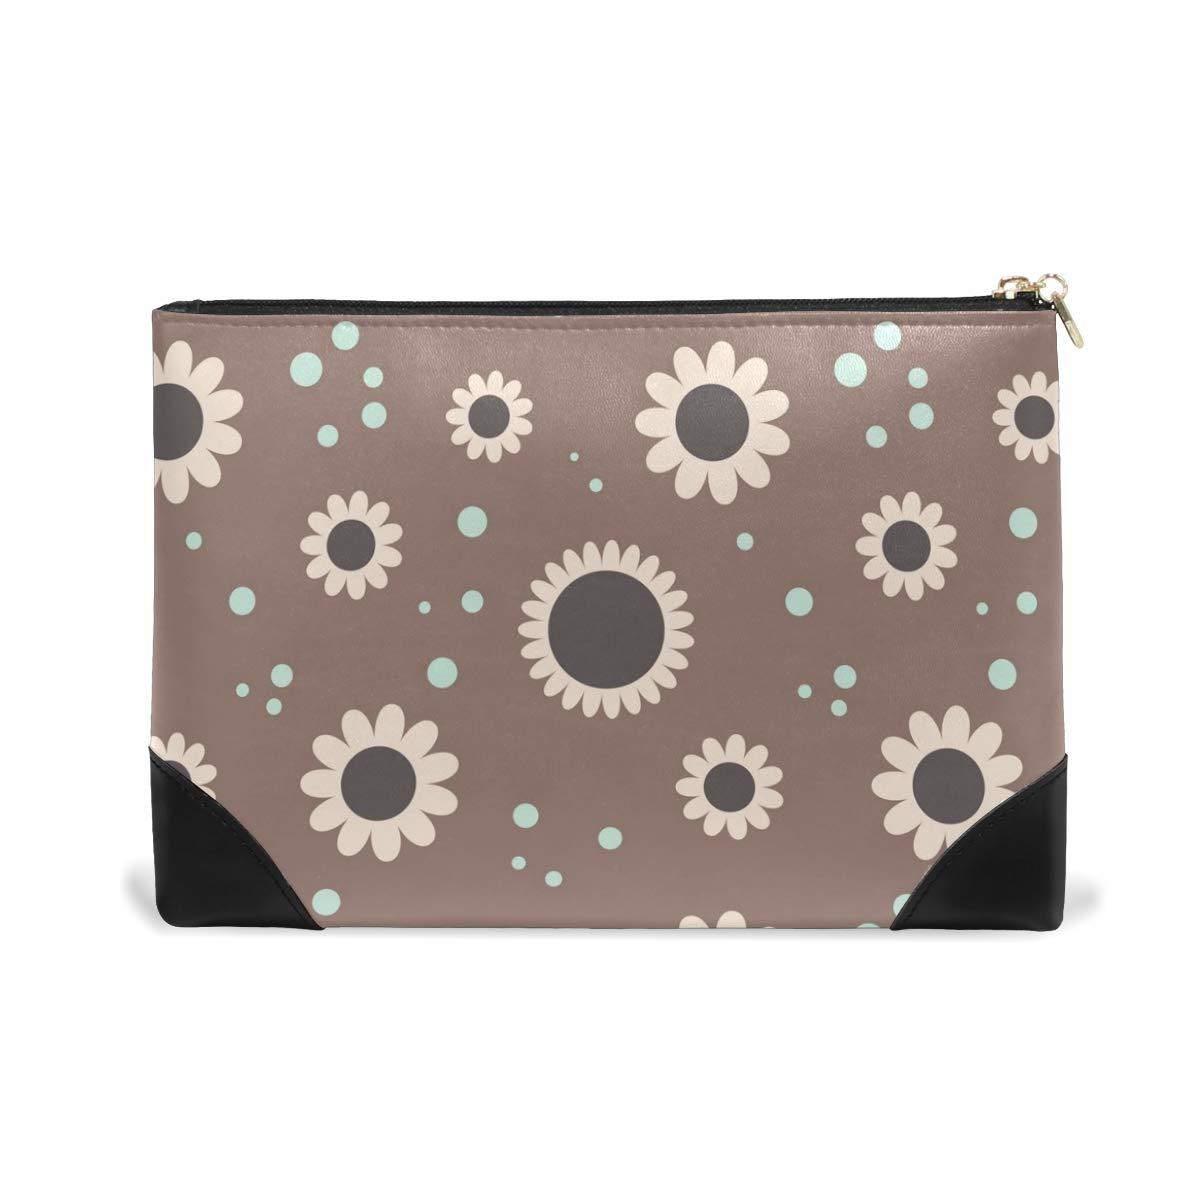 Women Makeup Bag Flower Polka Dot Genuine Leather Zipper Cosmetics Pouch Lady Toiletry Bag